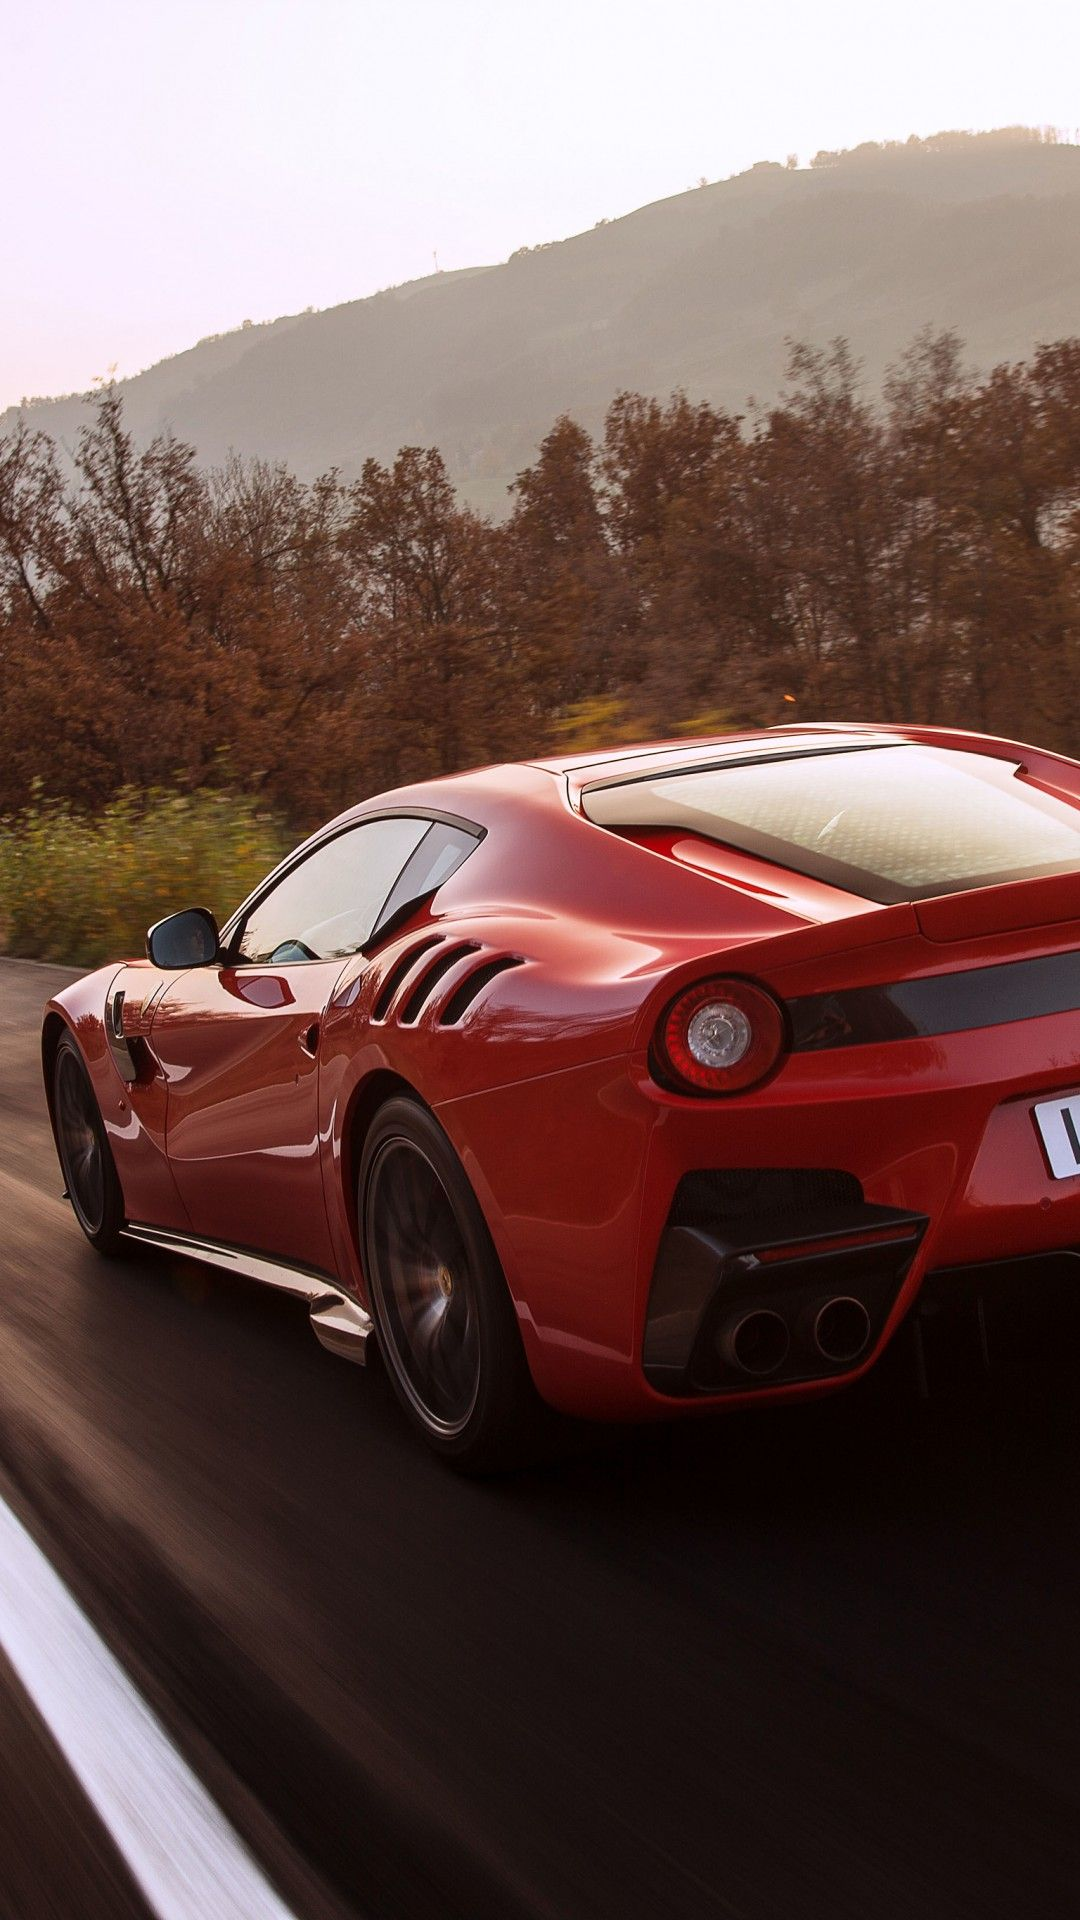 Ferrari Iphone Wallpapers 1080x1920 Car Iphone Wallpaper